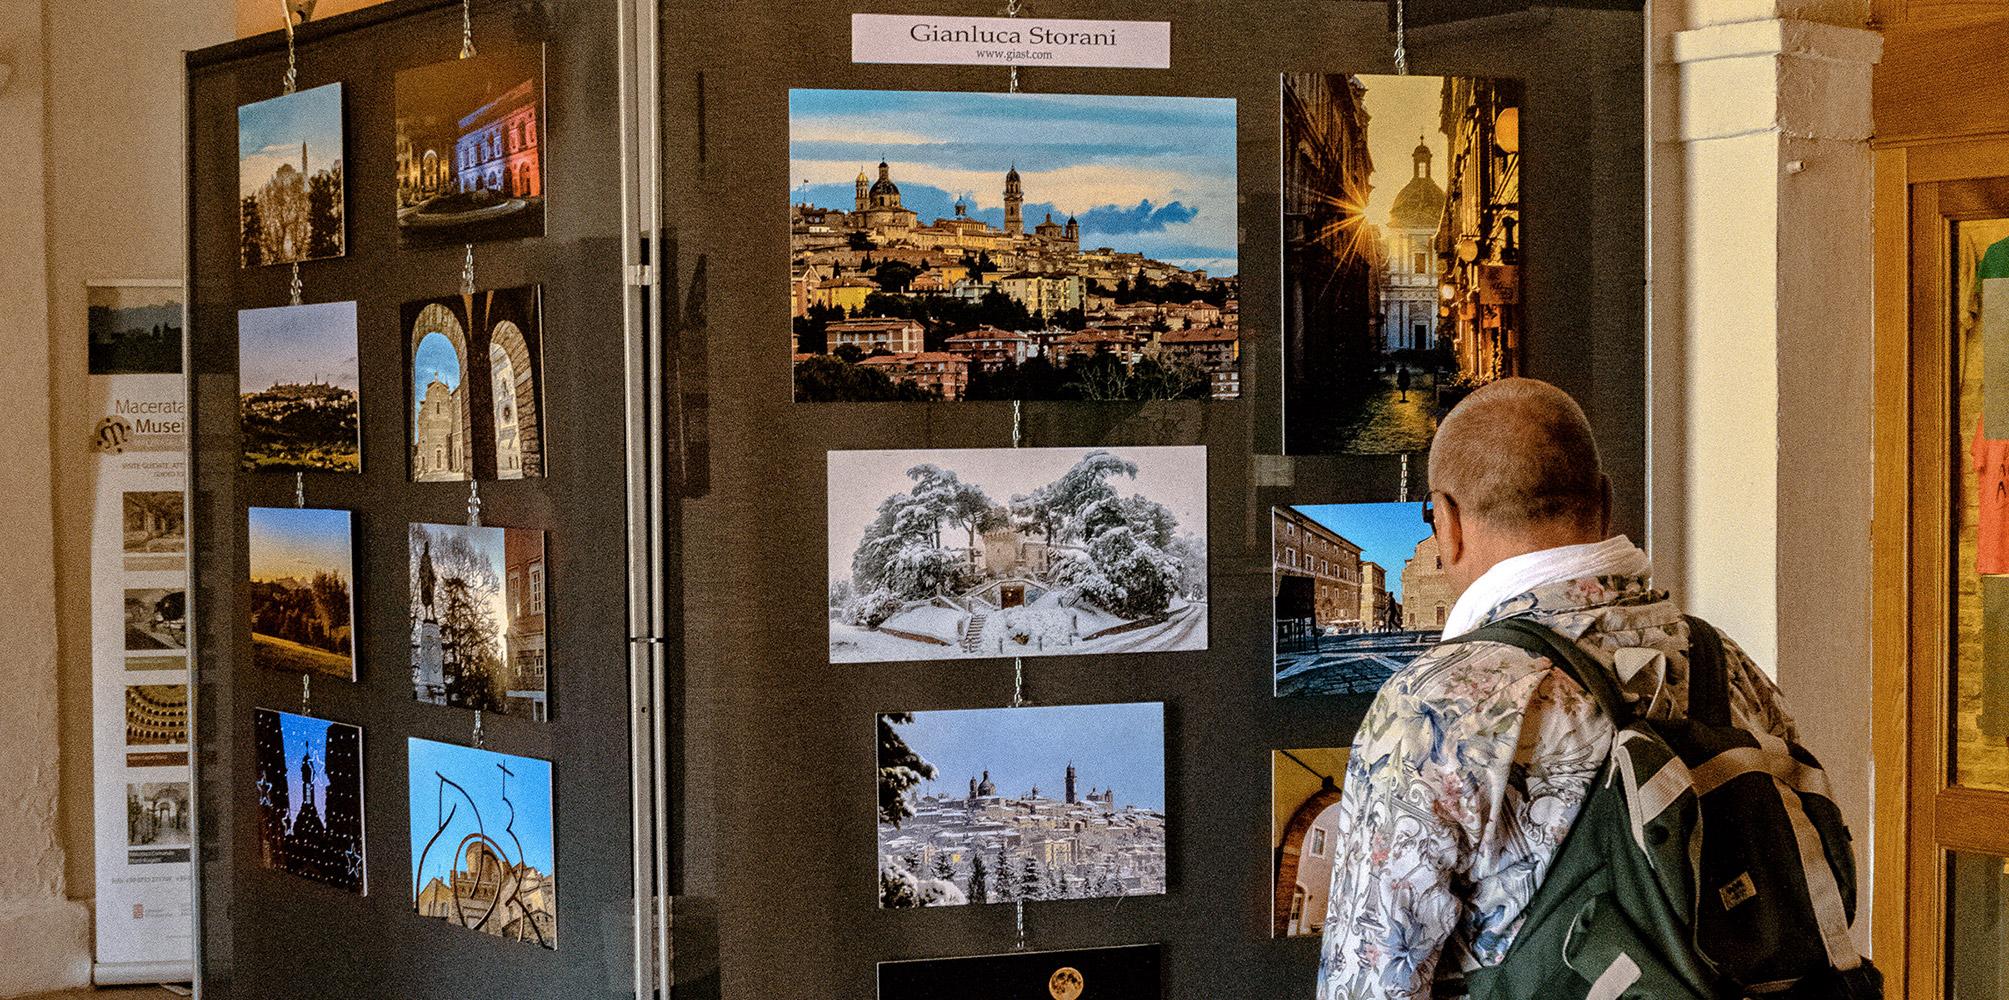 Mura in Festa 2017 - Gianluca Storani Photo Art  (ID: 4-2927)